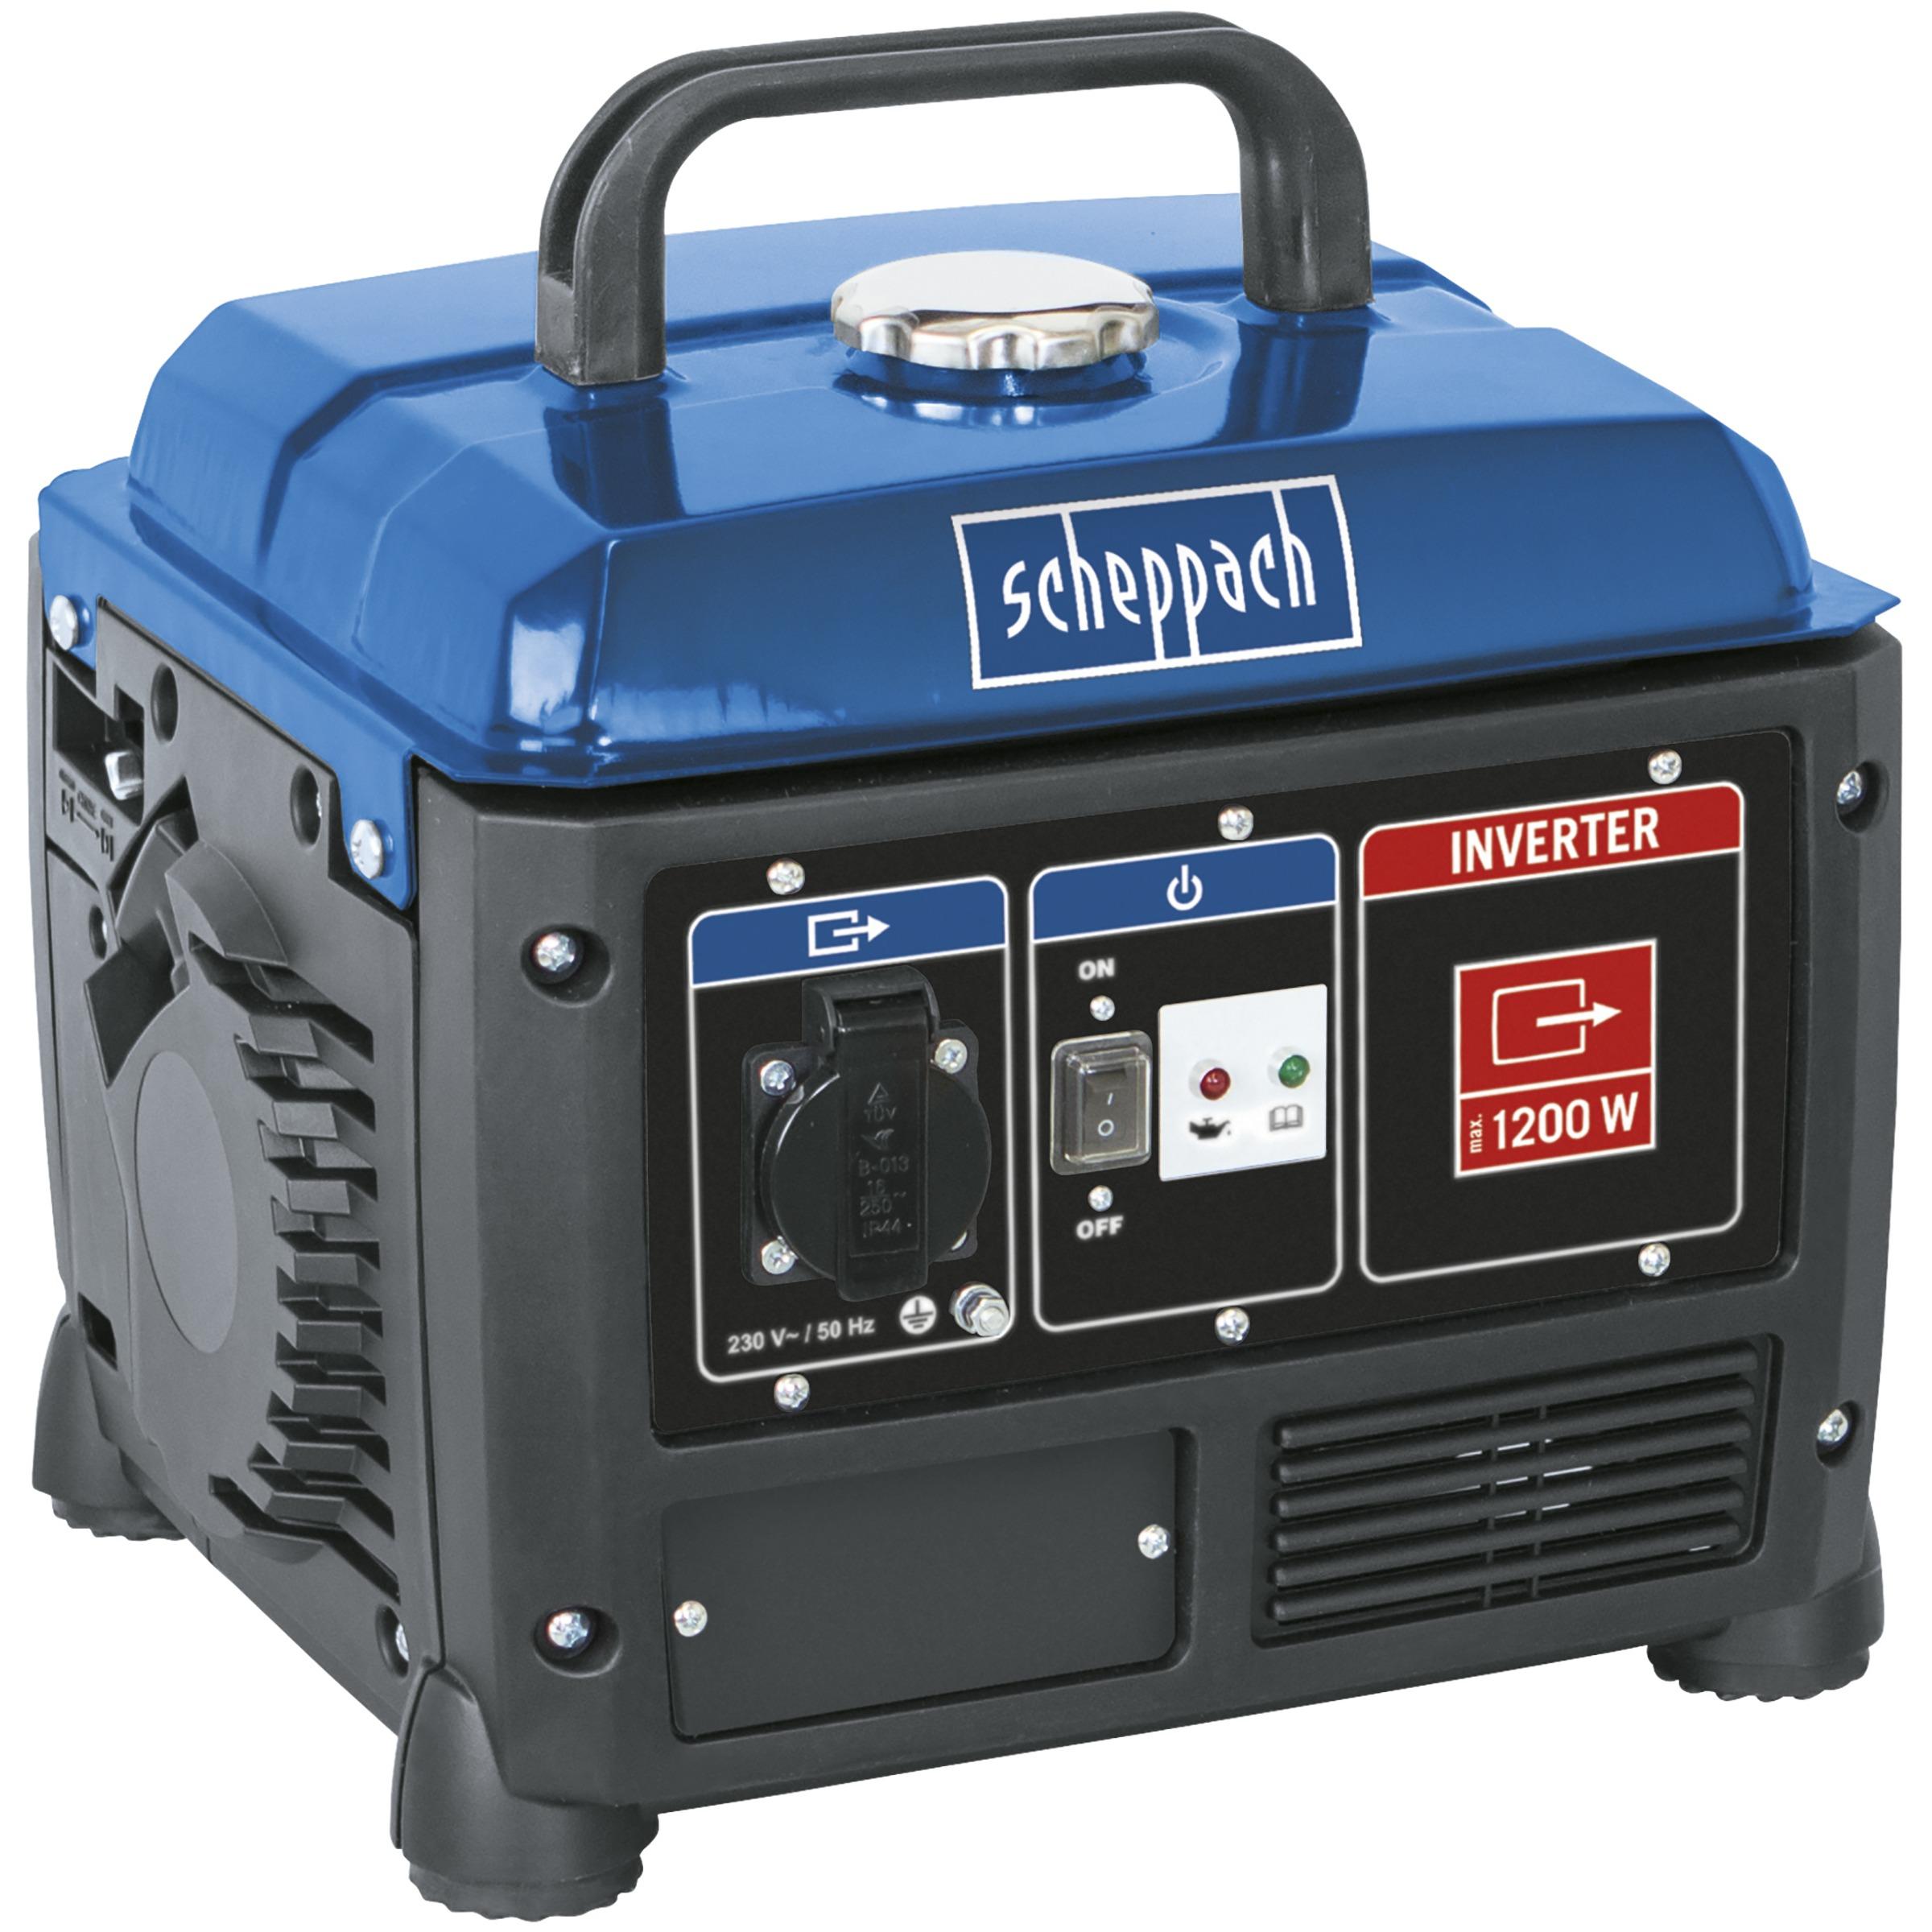 SG1200 Stroomgenerator 1200 watt